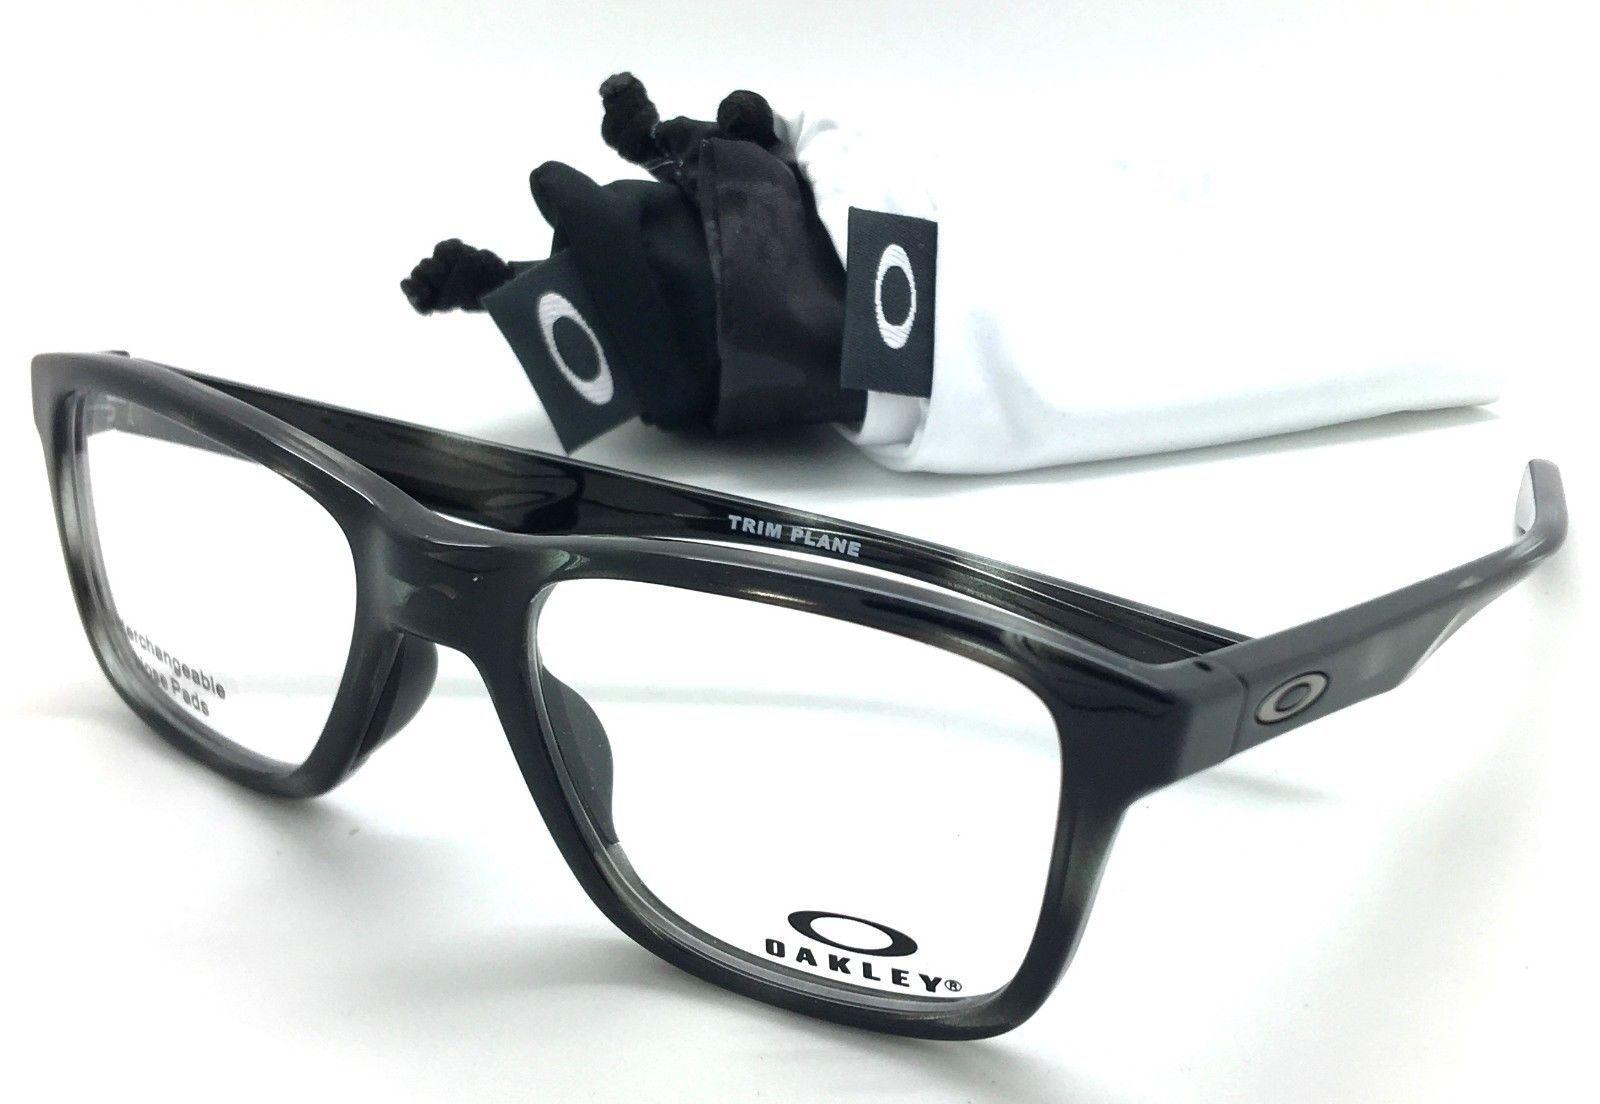 3dc88187bcf Neu Oakley Rx OX8107 0451 Verzierung and 50 similar items